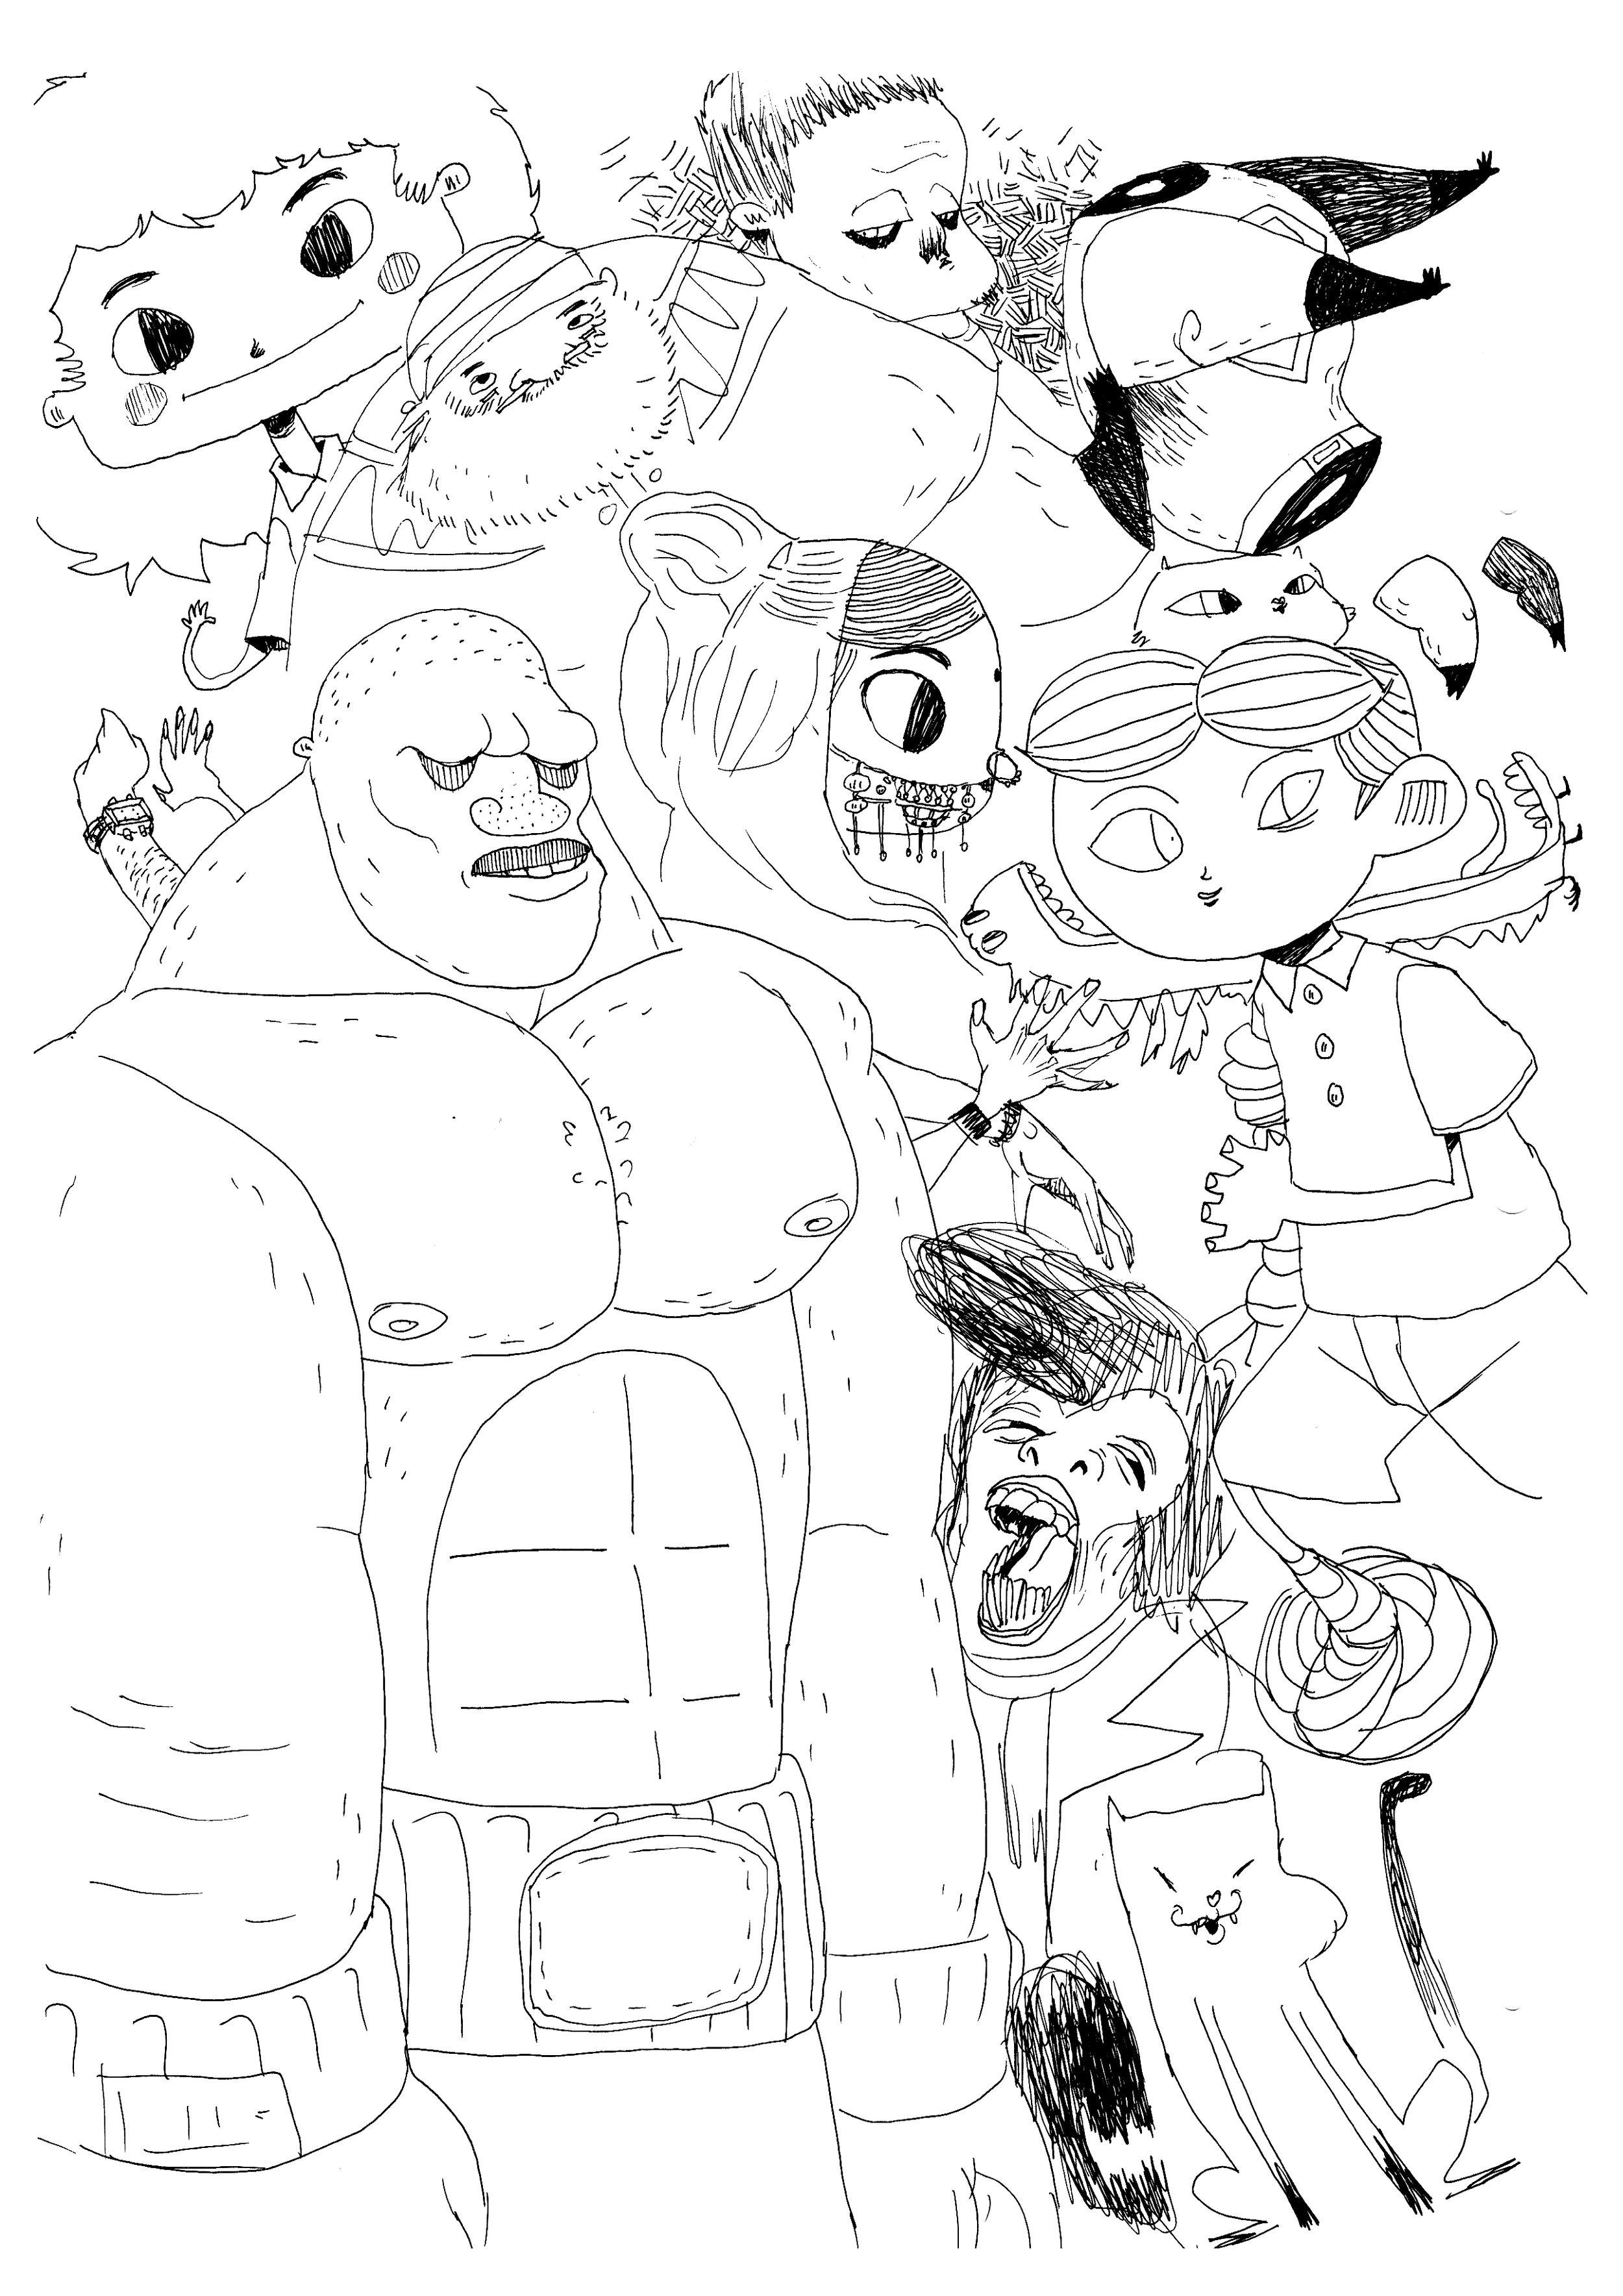 Pascal_Zaffiro_Doodle_7.jpg